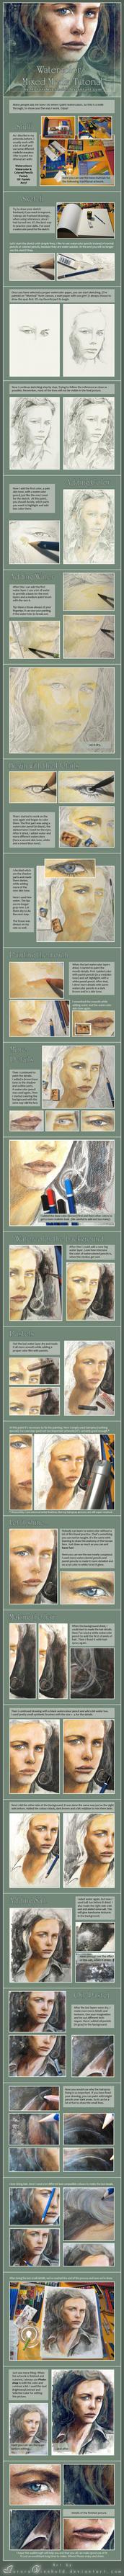 Watercolour Tutorial by AuroraWienhold